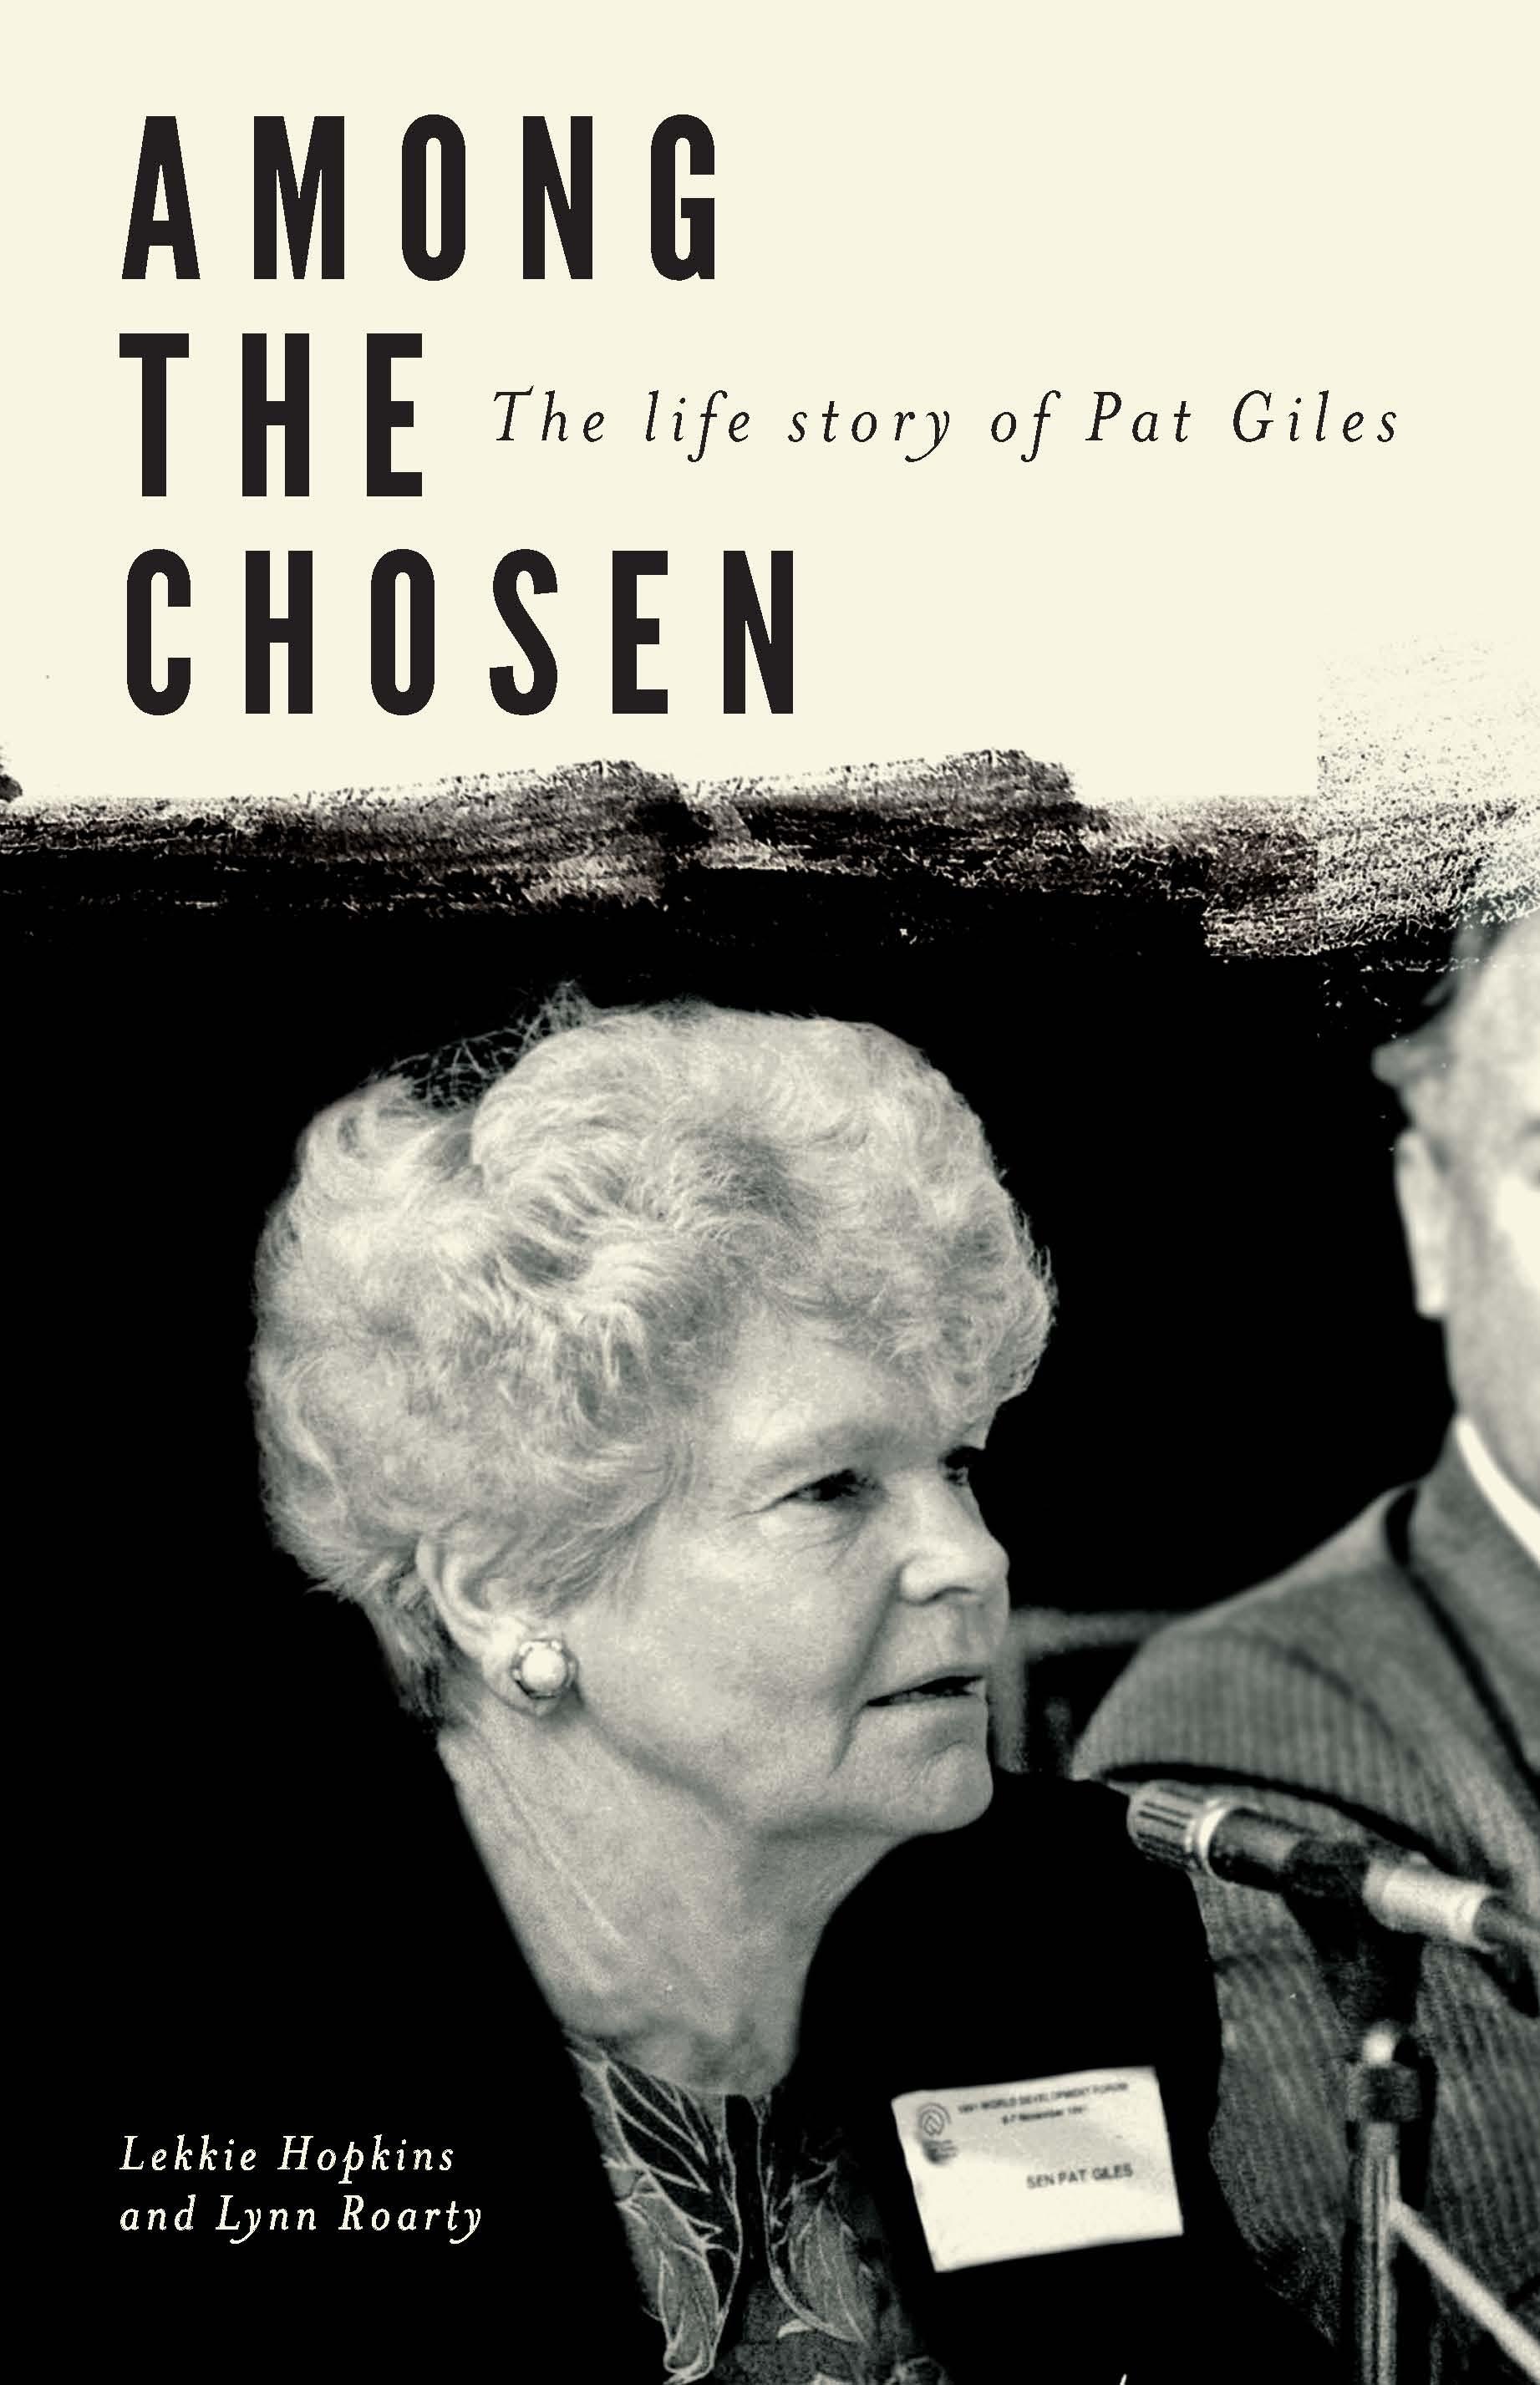 Among the Chosen: The Life Story of Pat Giles